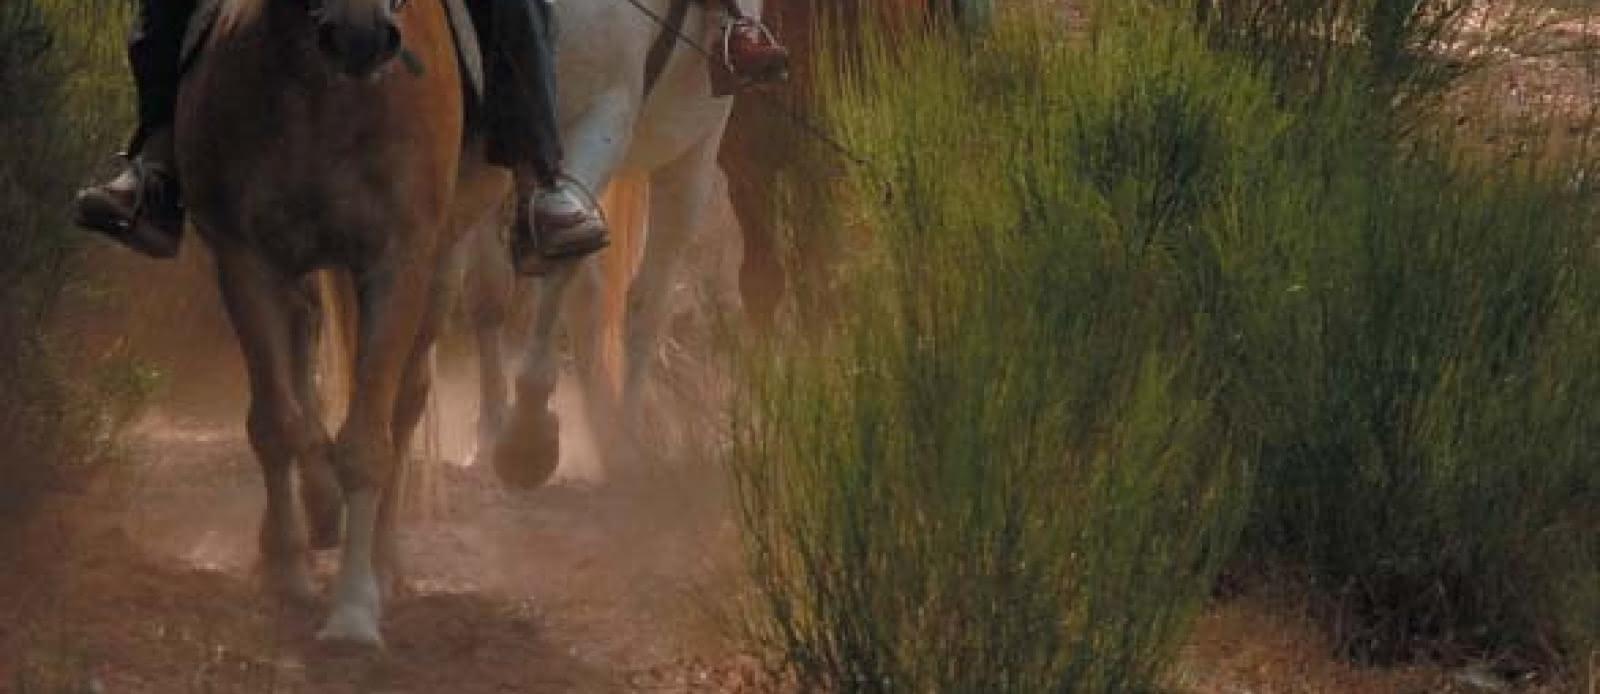 Equitation plaisir 24